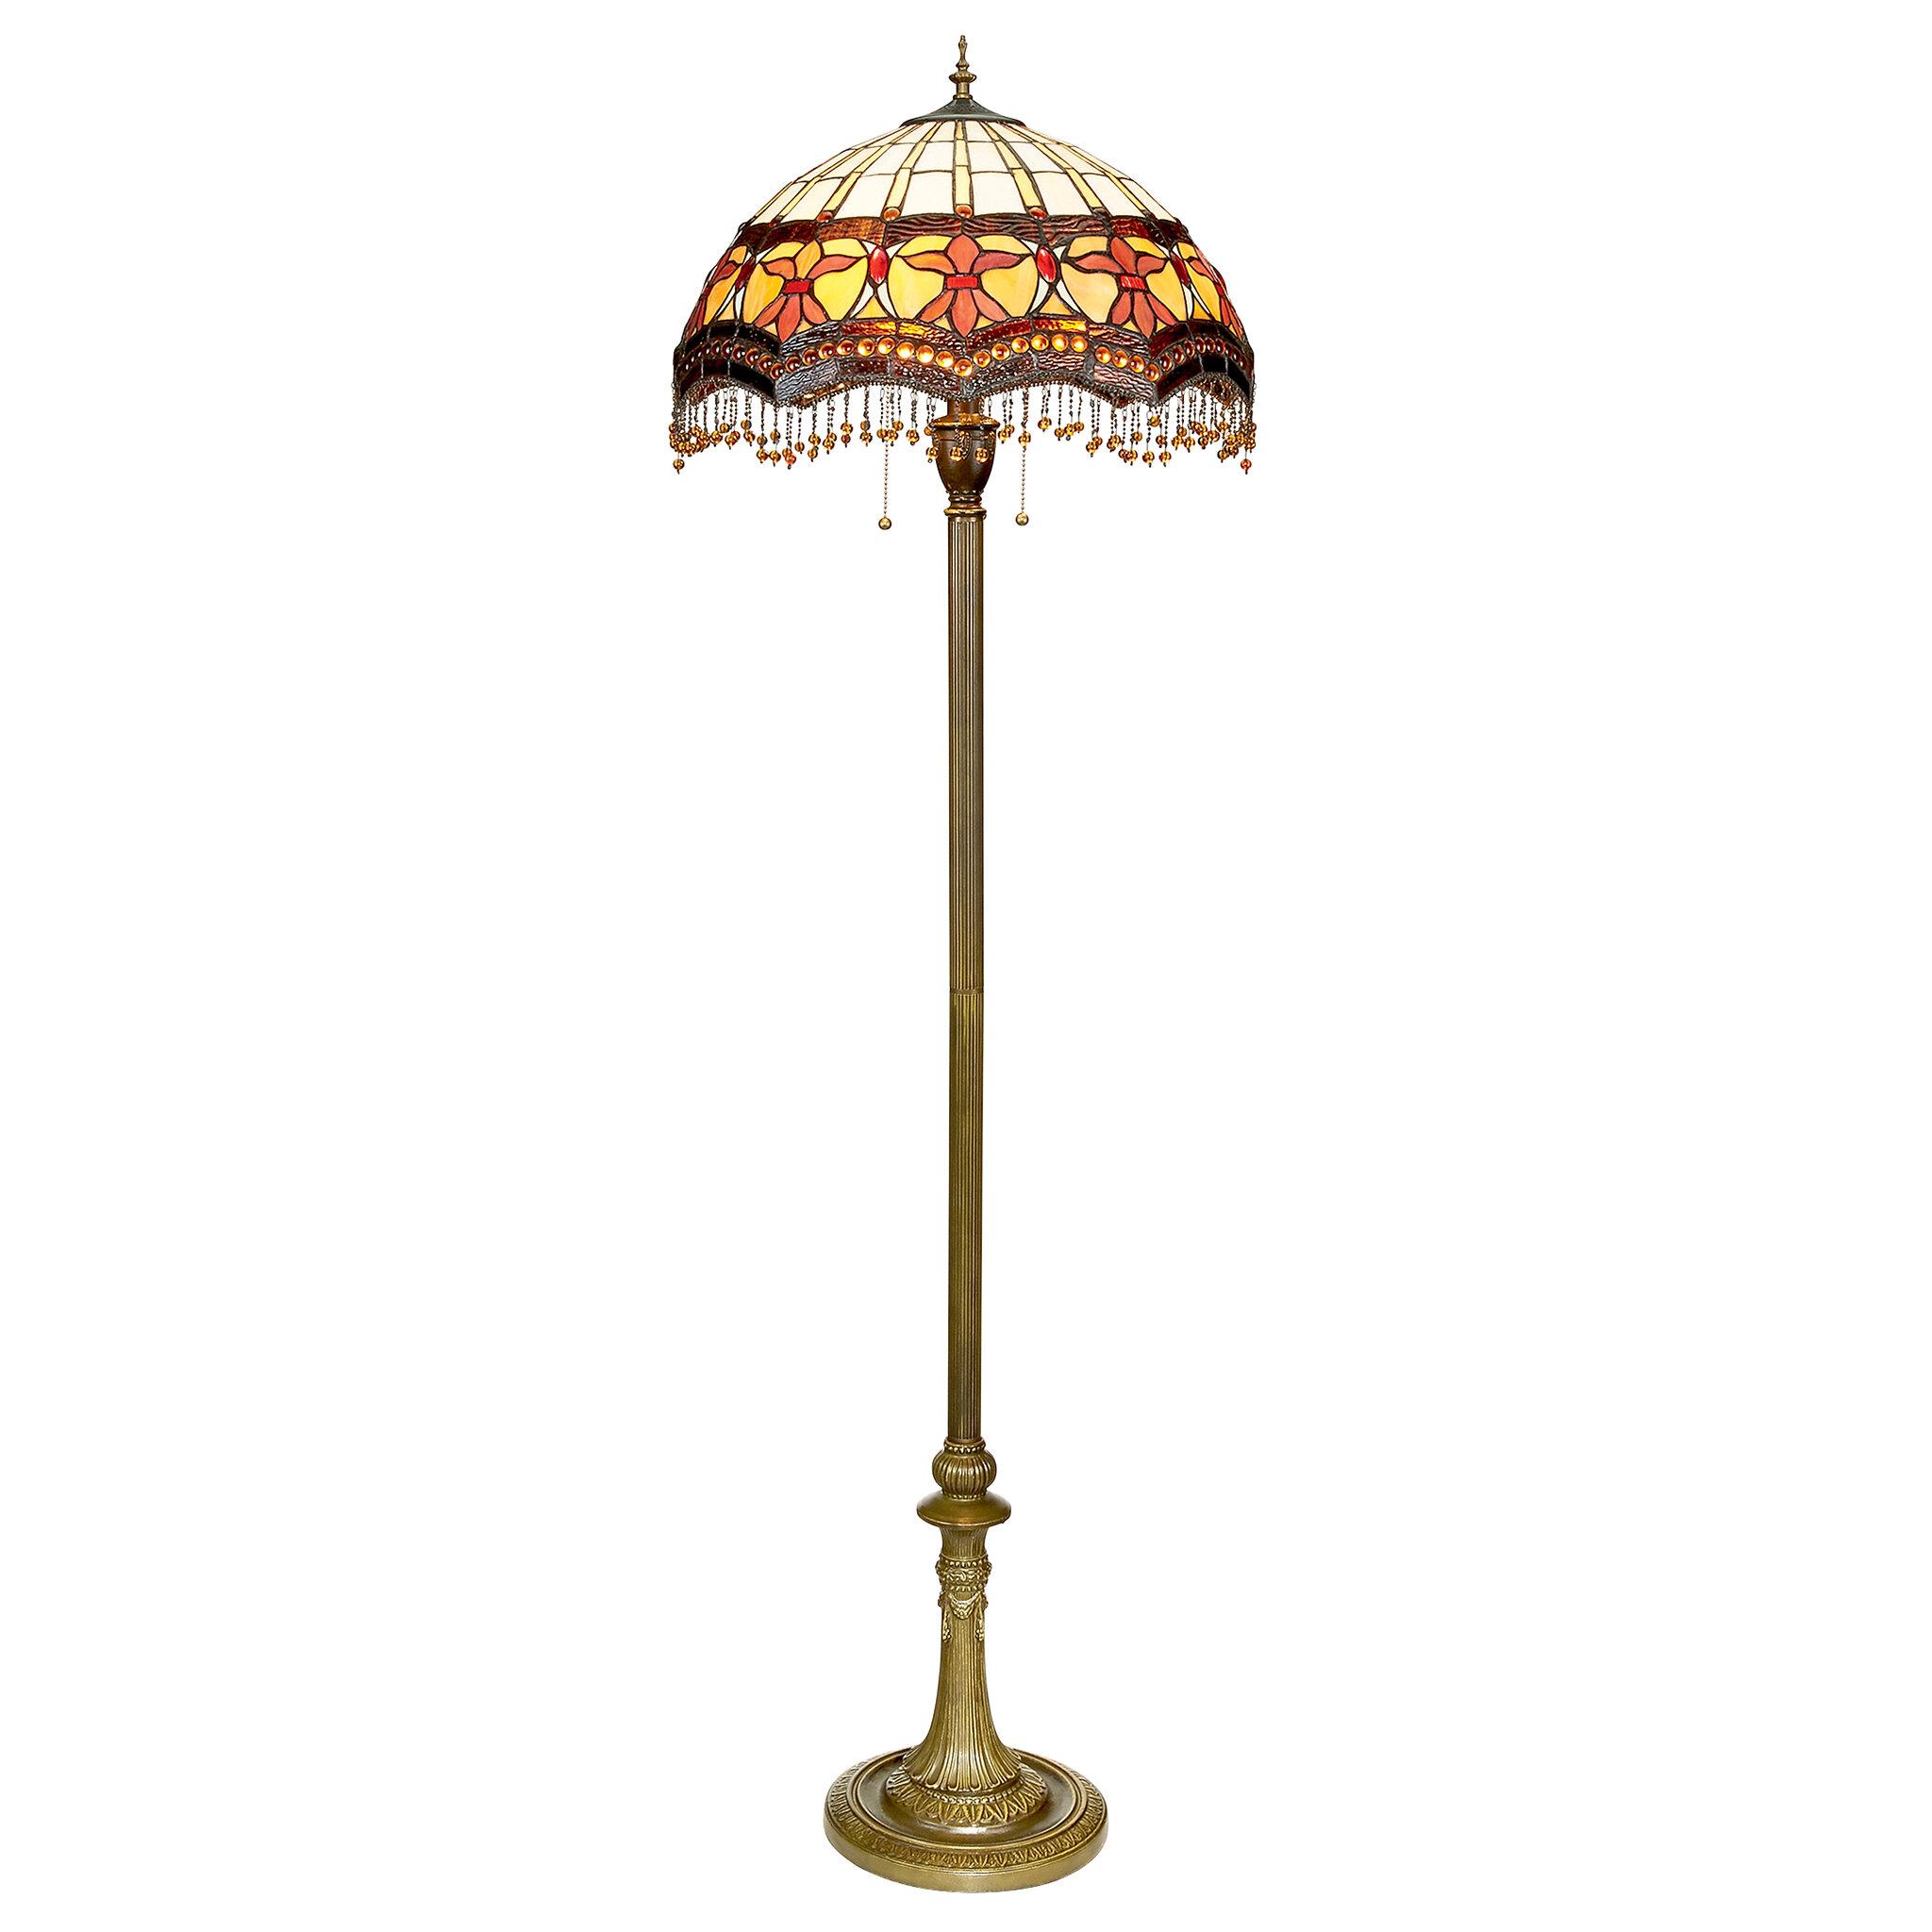 Victorian Parlor Tiffany 63 Floor Lamp